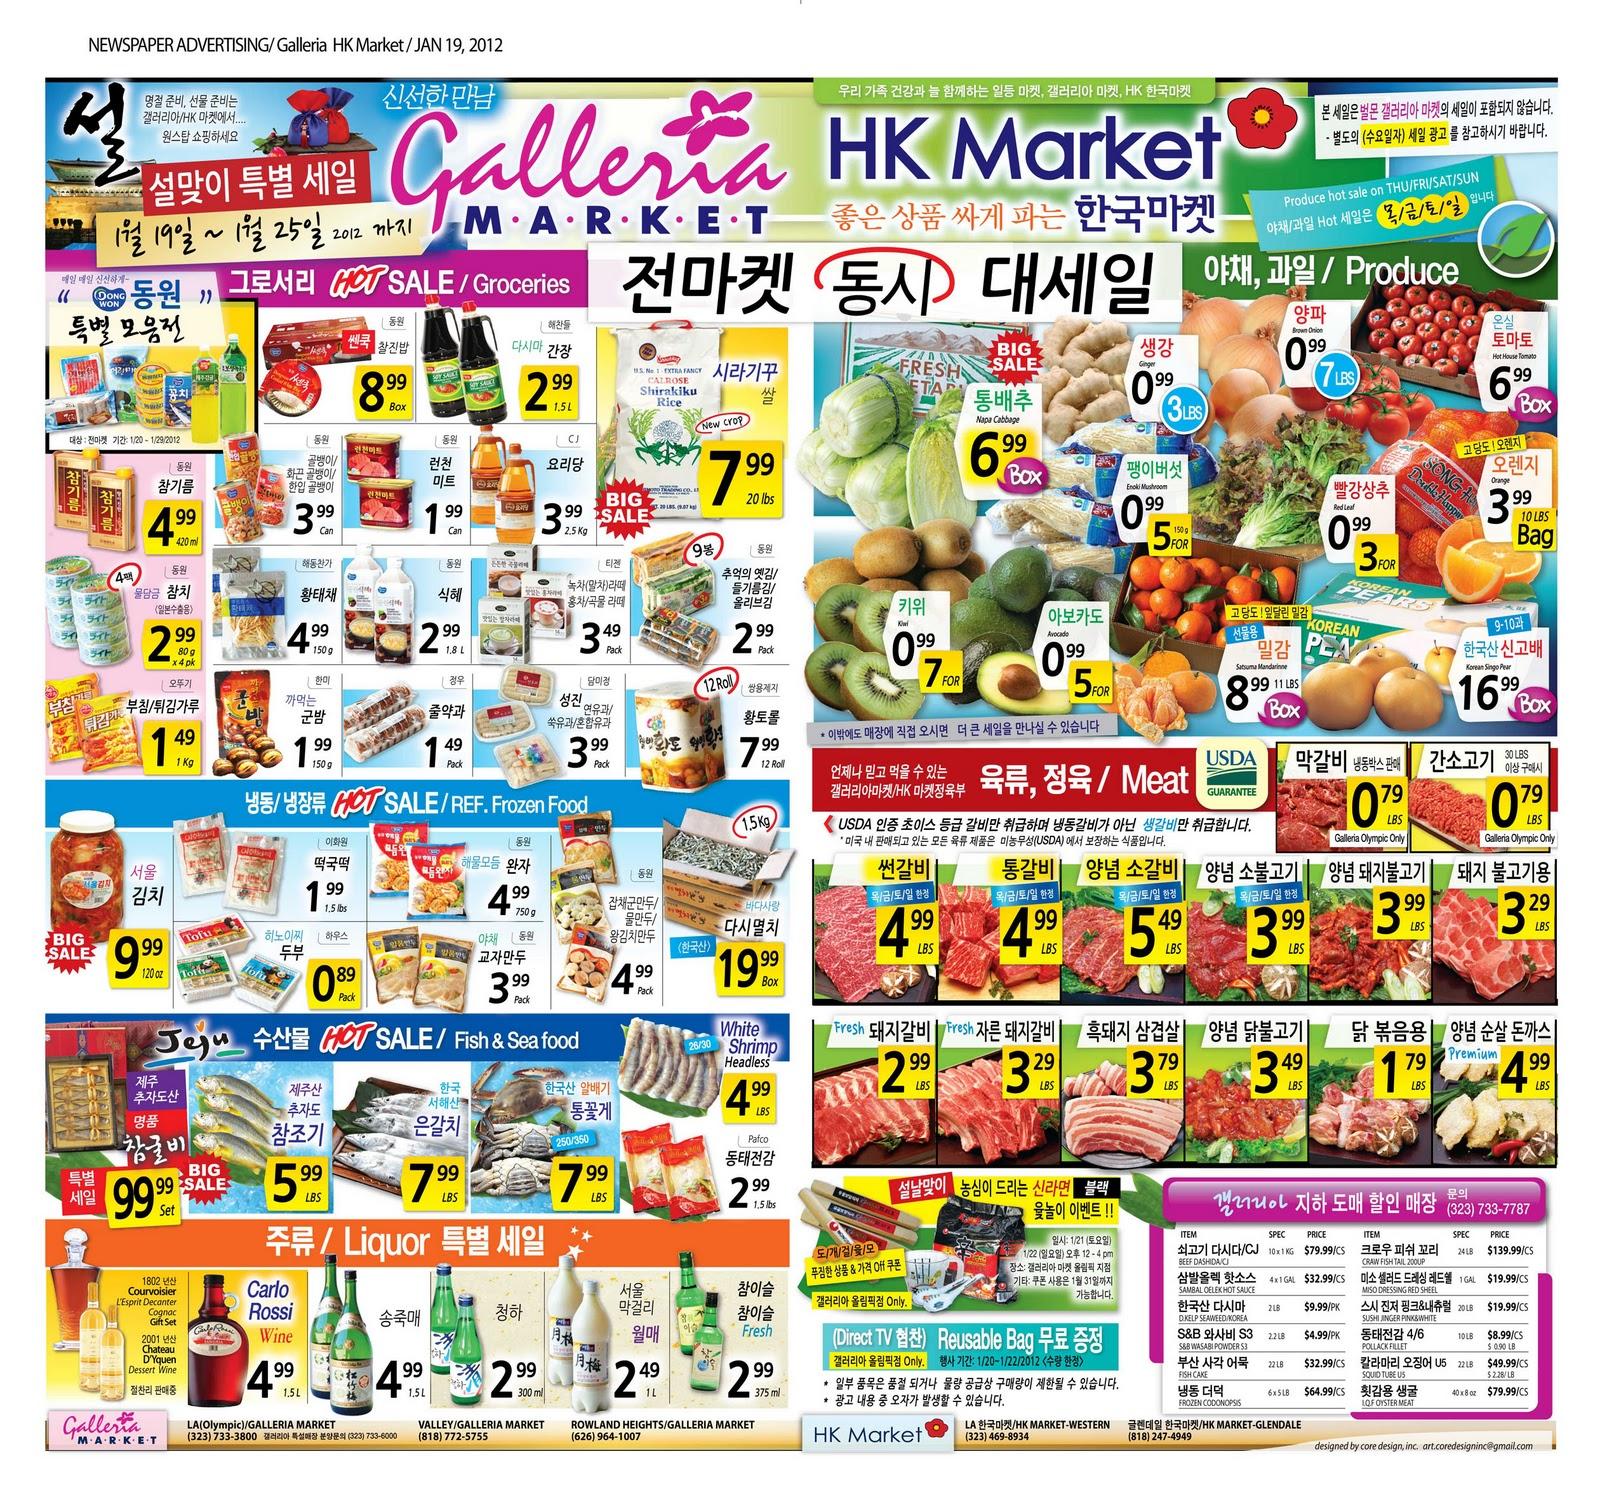 Market Ads in California: L.A. Korean Market Ads - Galleria Market - Jan. 19 ~ Jan. 25